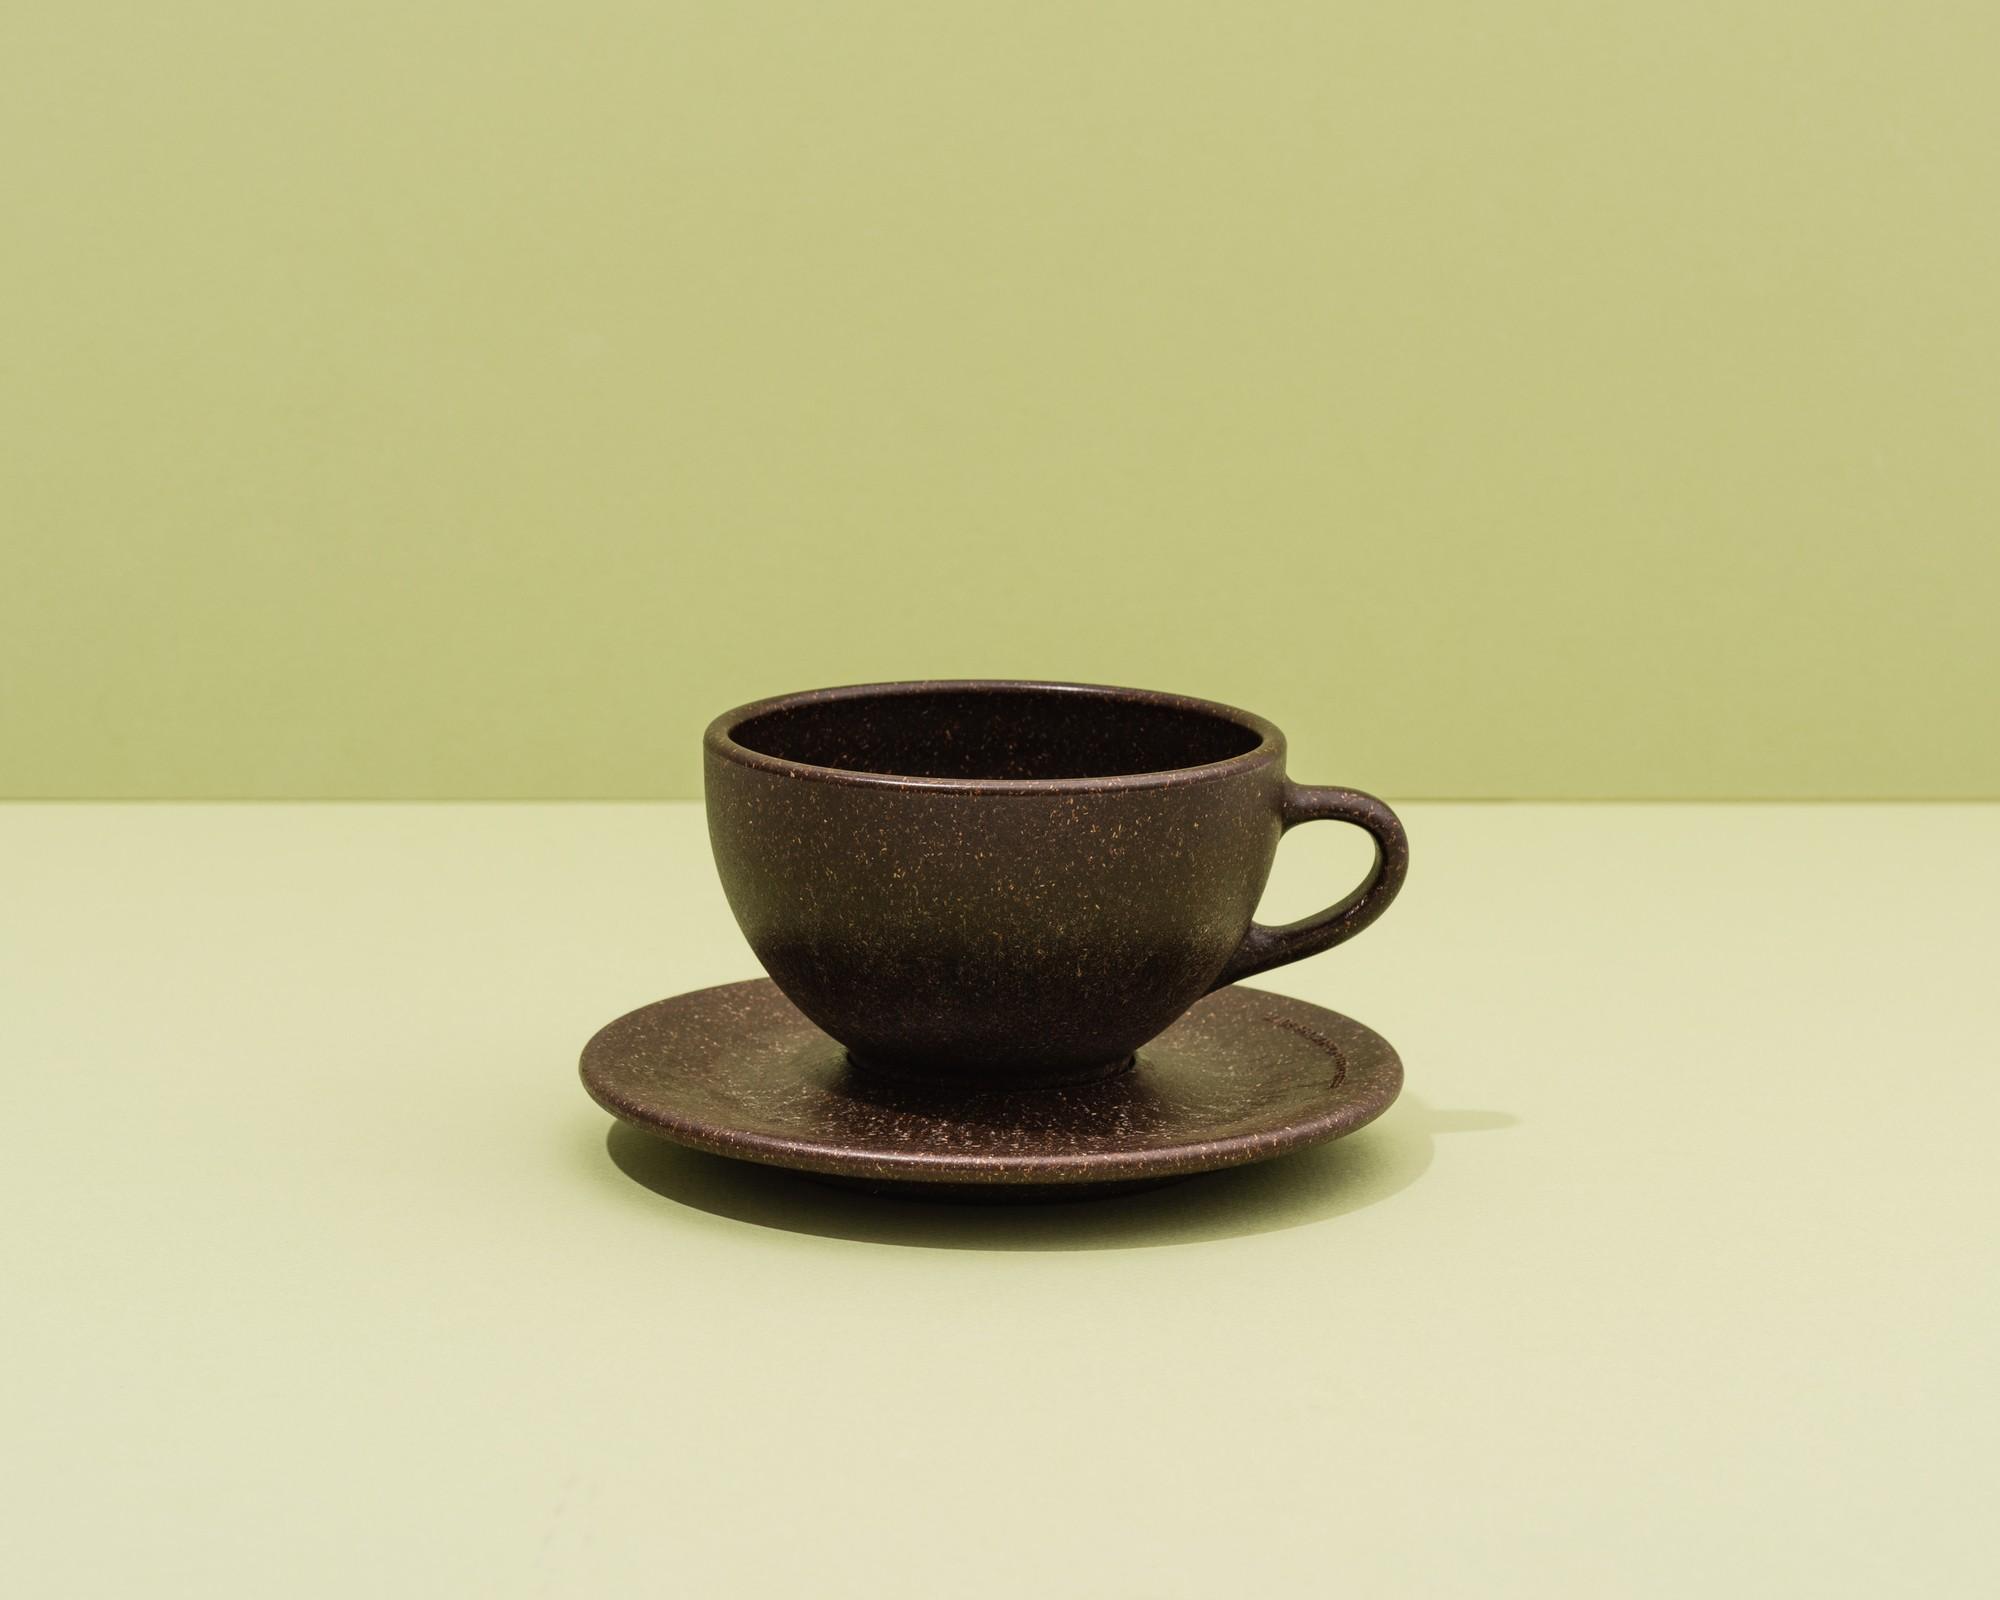 Kaffeeform – Latte Cup